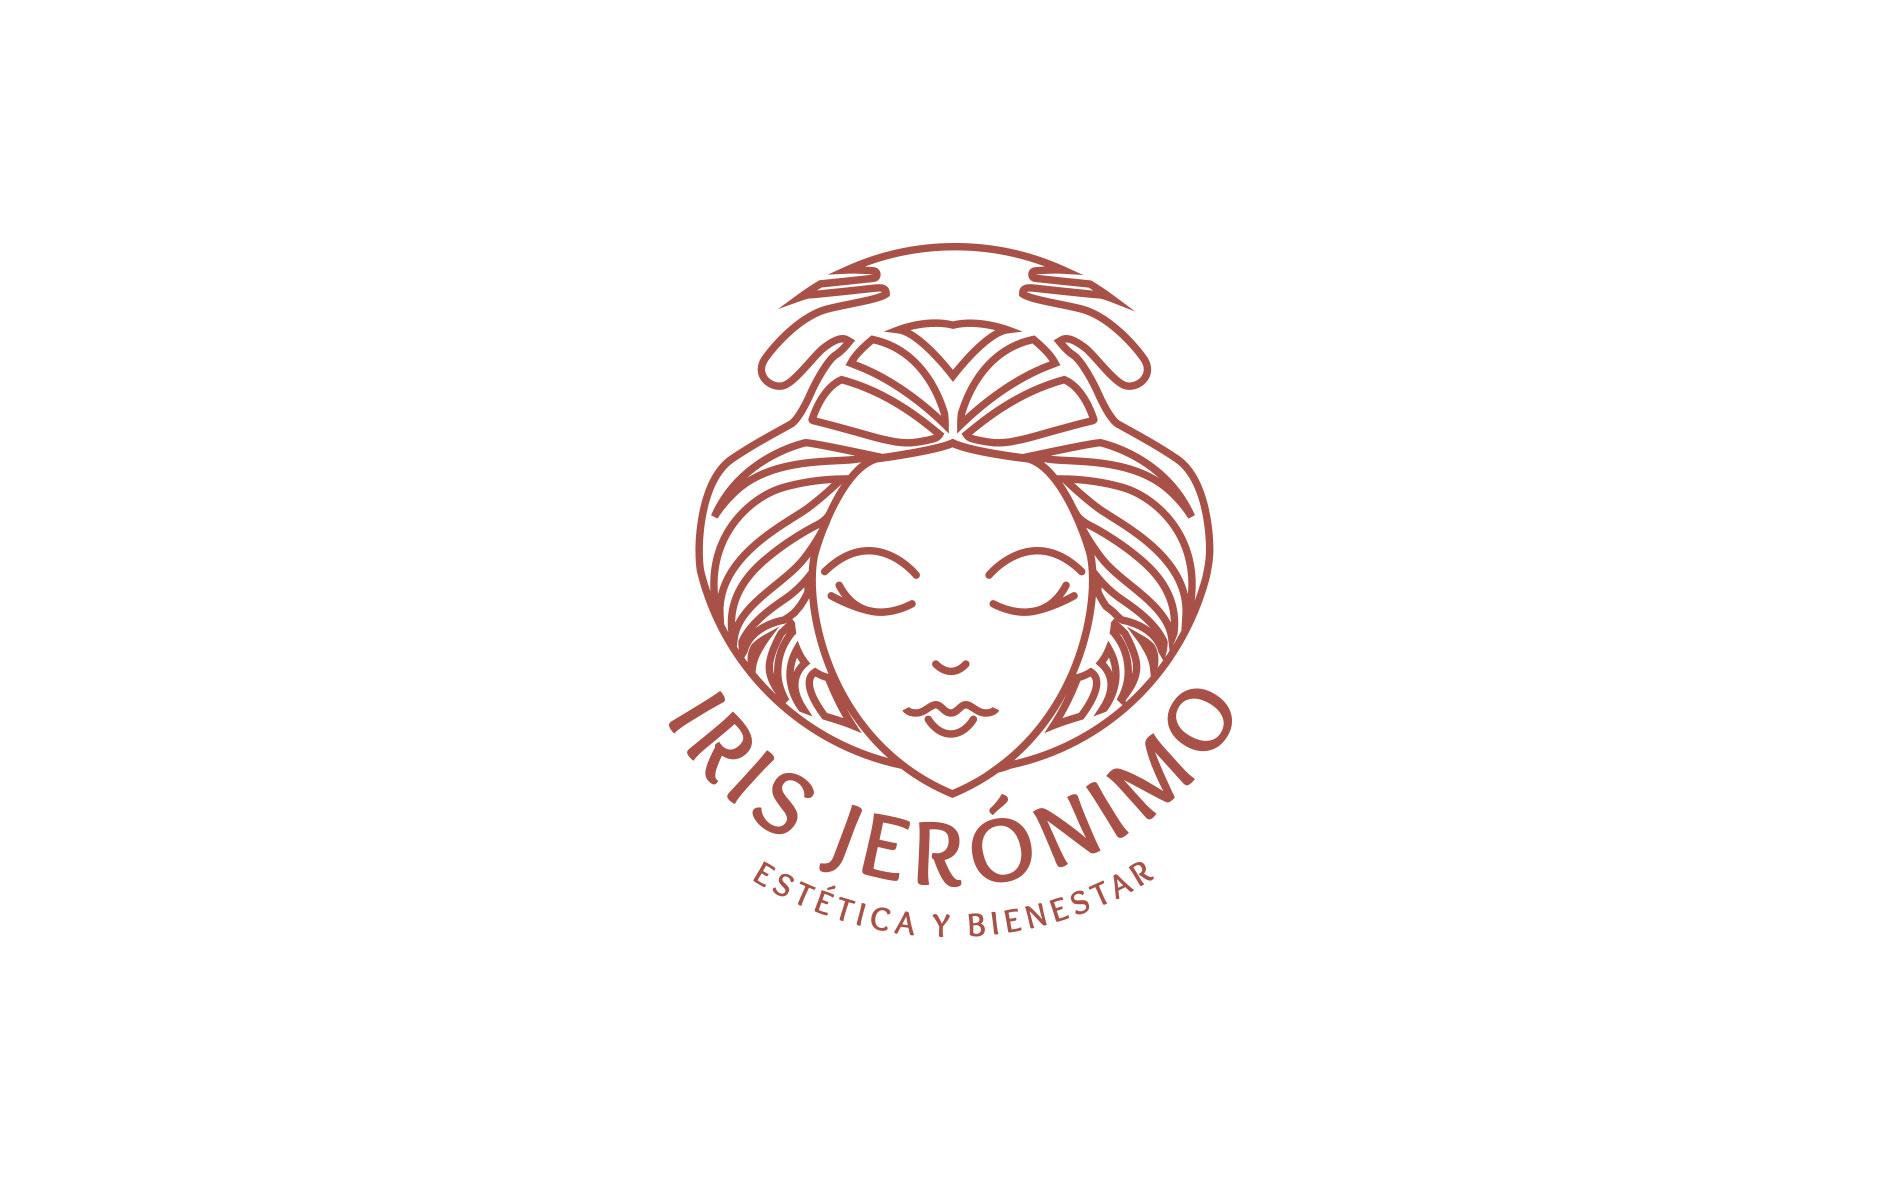 Iris Jerónimo - Diseño de Marca 2